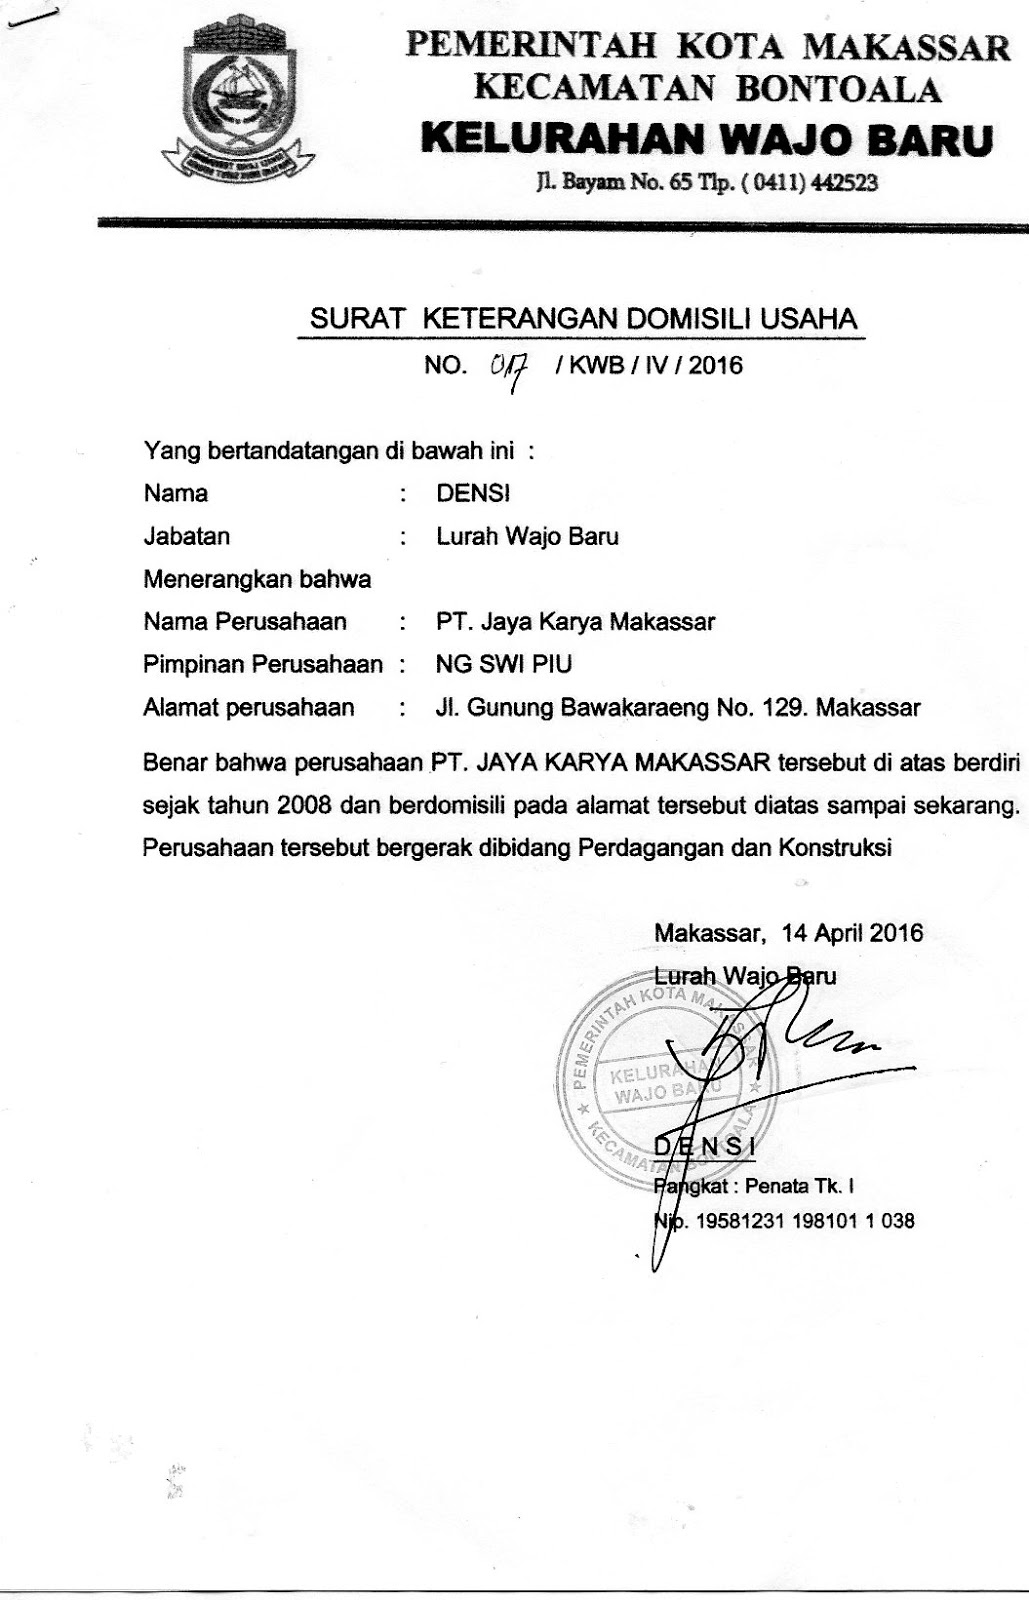 Pt Jaya Karya Makassar Surat Keterangan Domisili Usaha Pt Jaya Karya Makassar